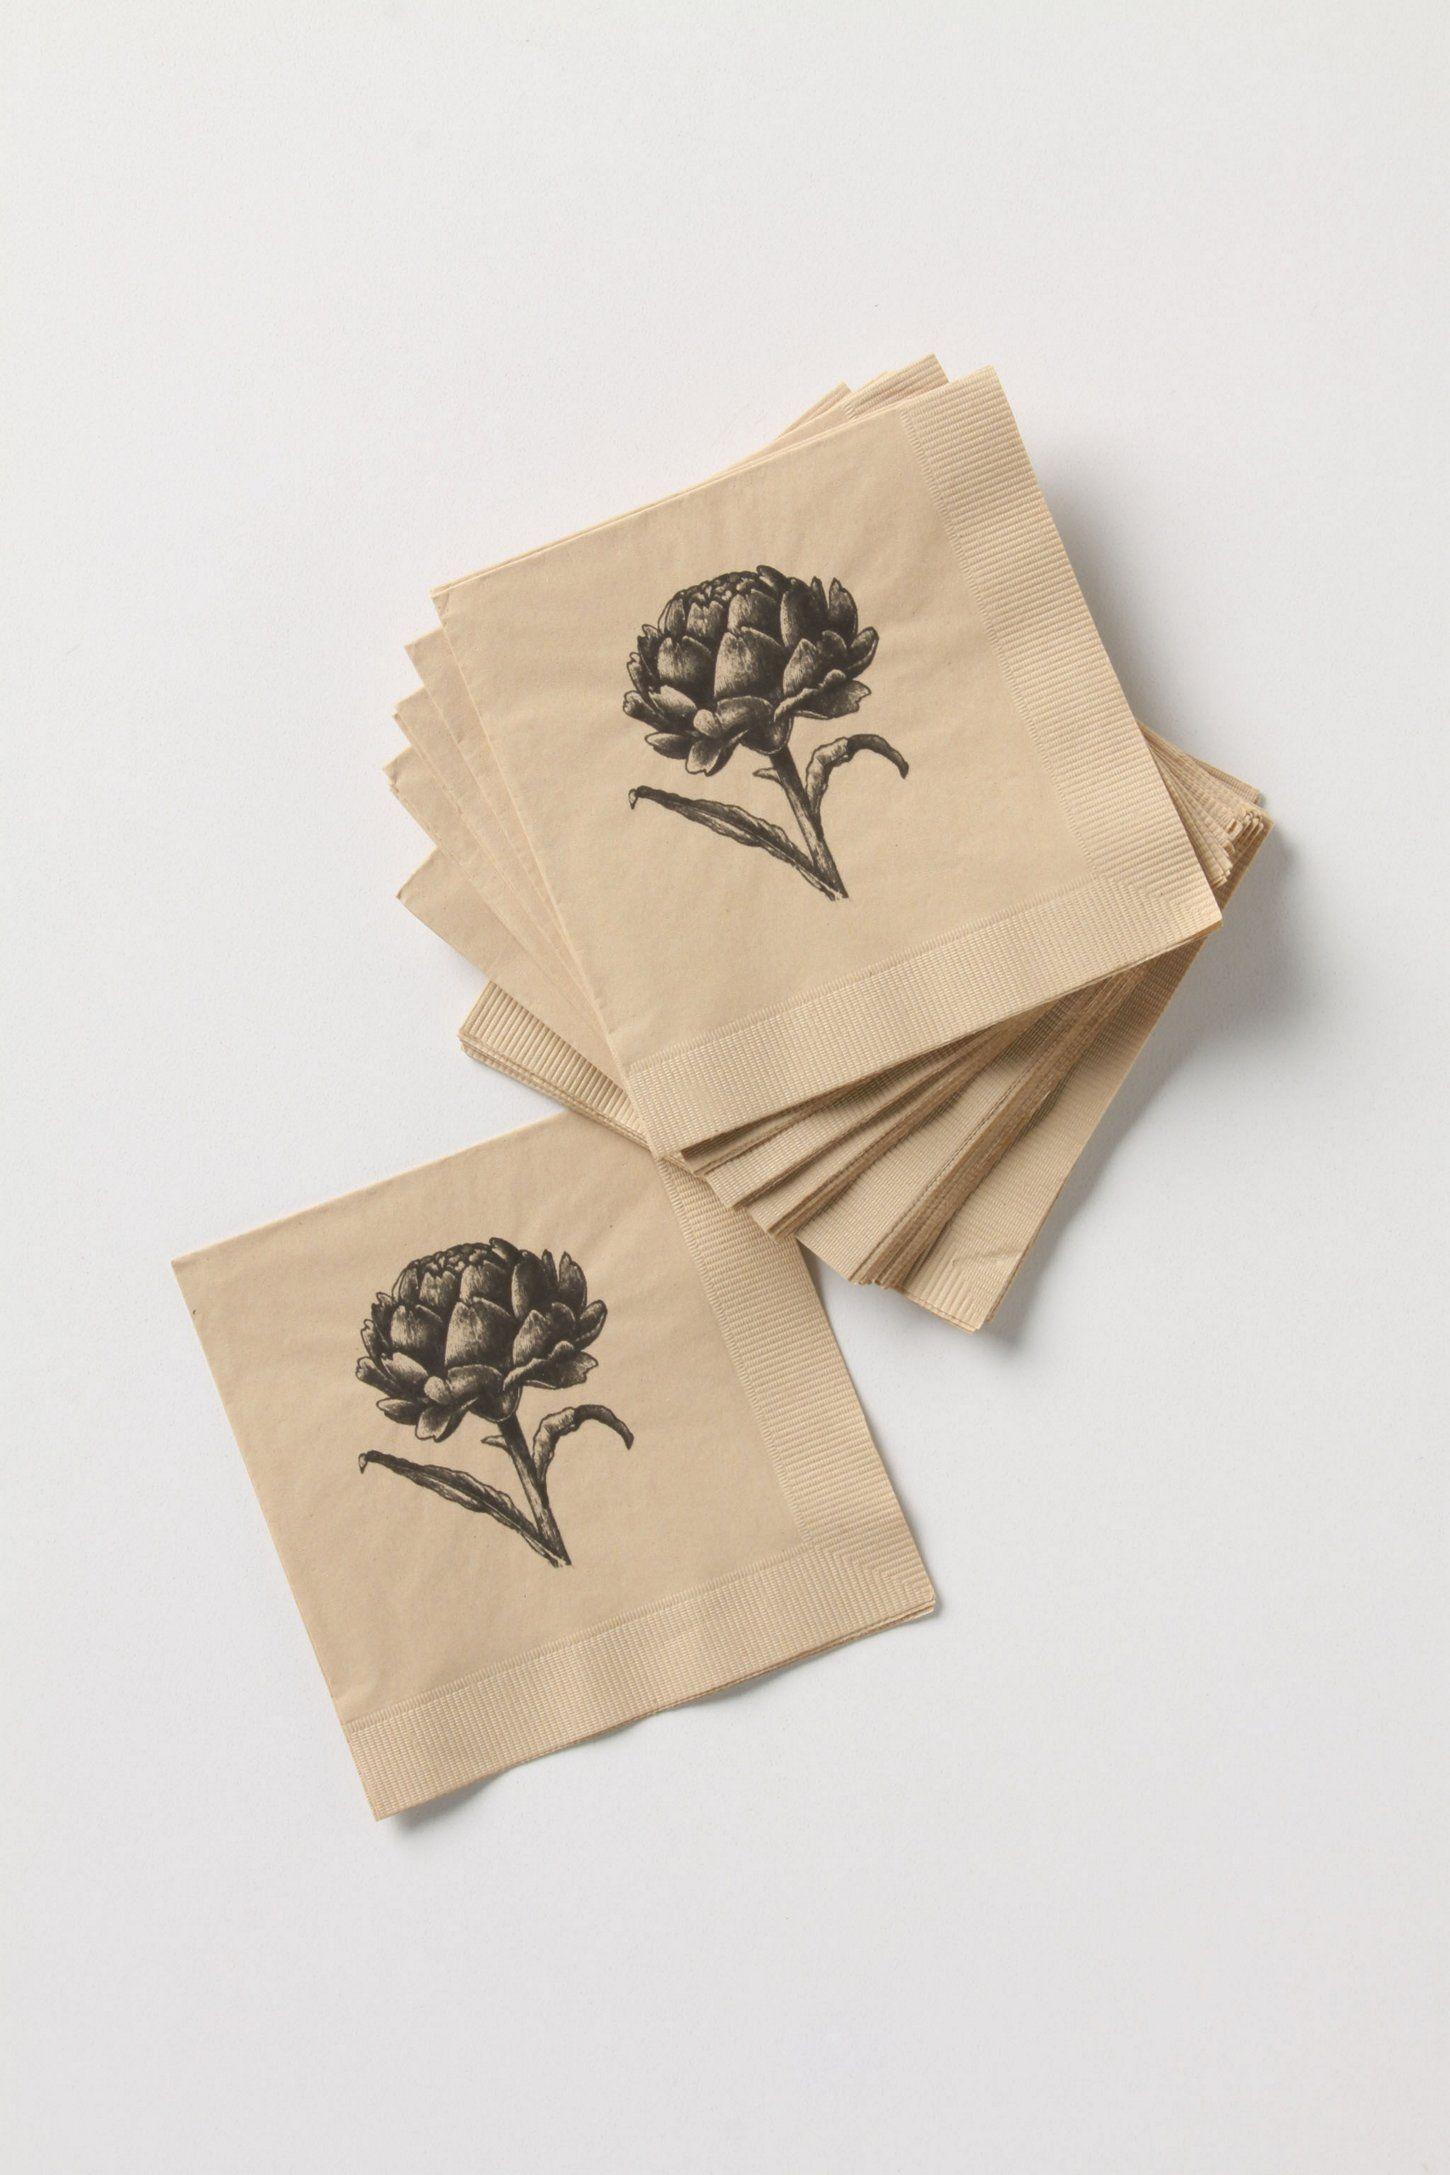 Aginares Paper Napkins - Anthropologie.com   Create ... - photo#27